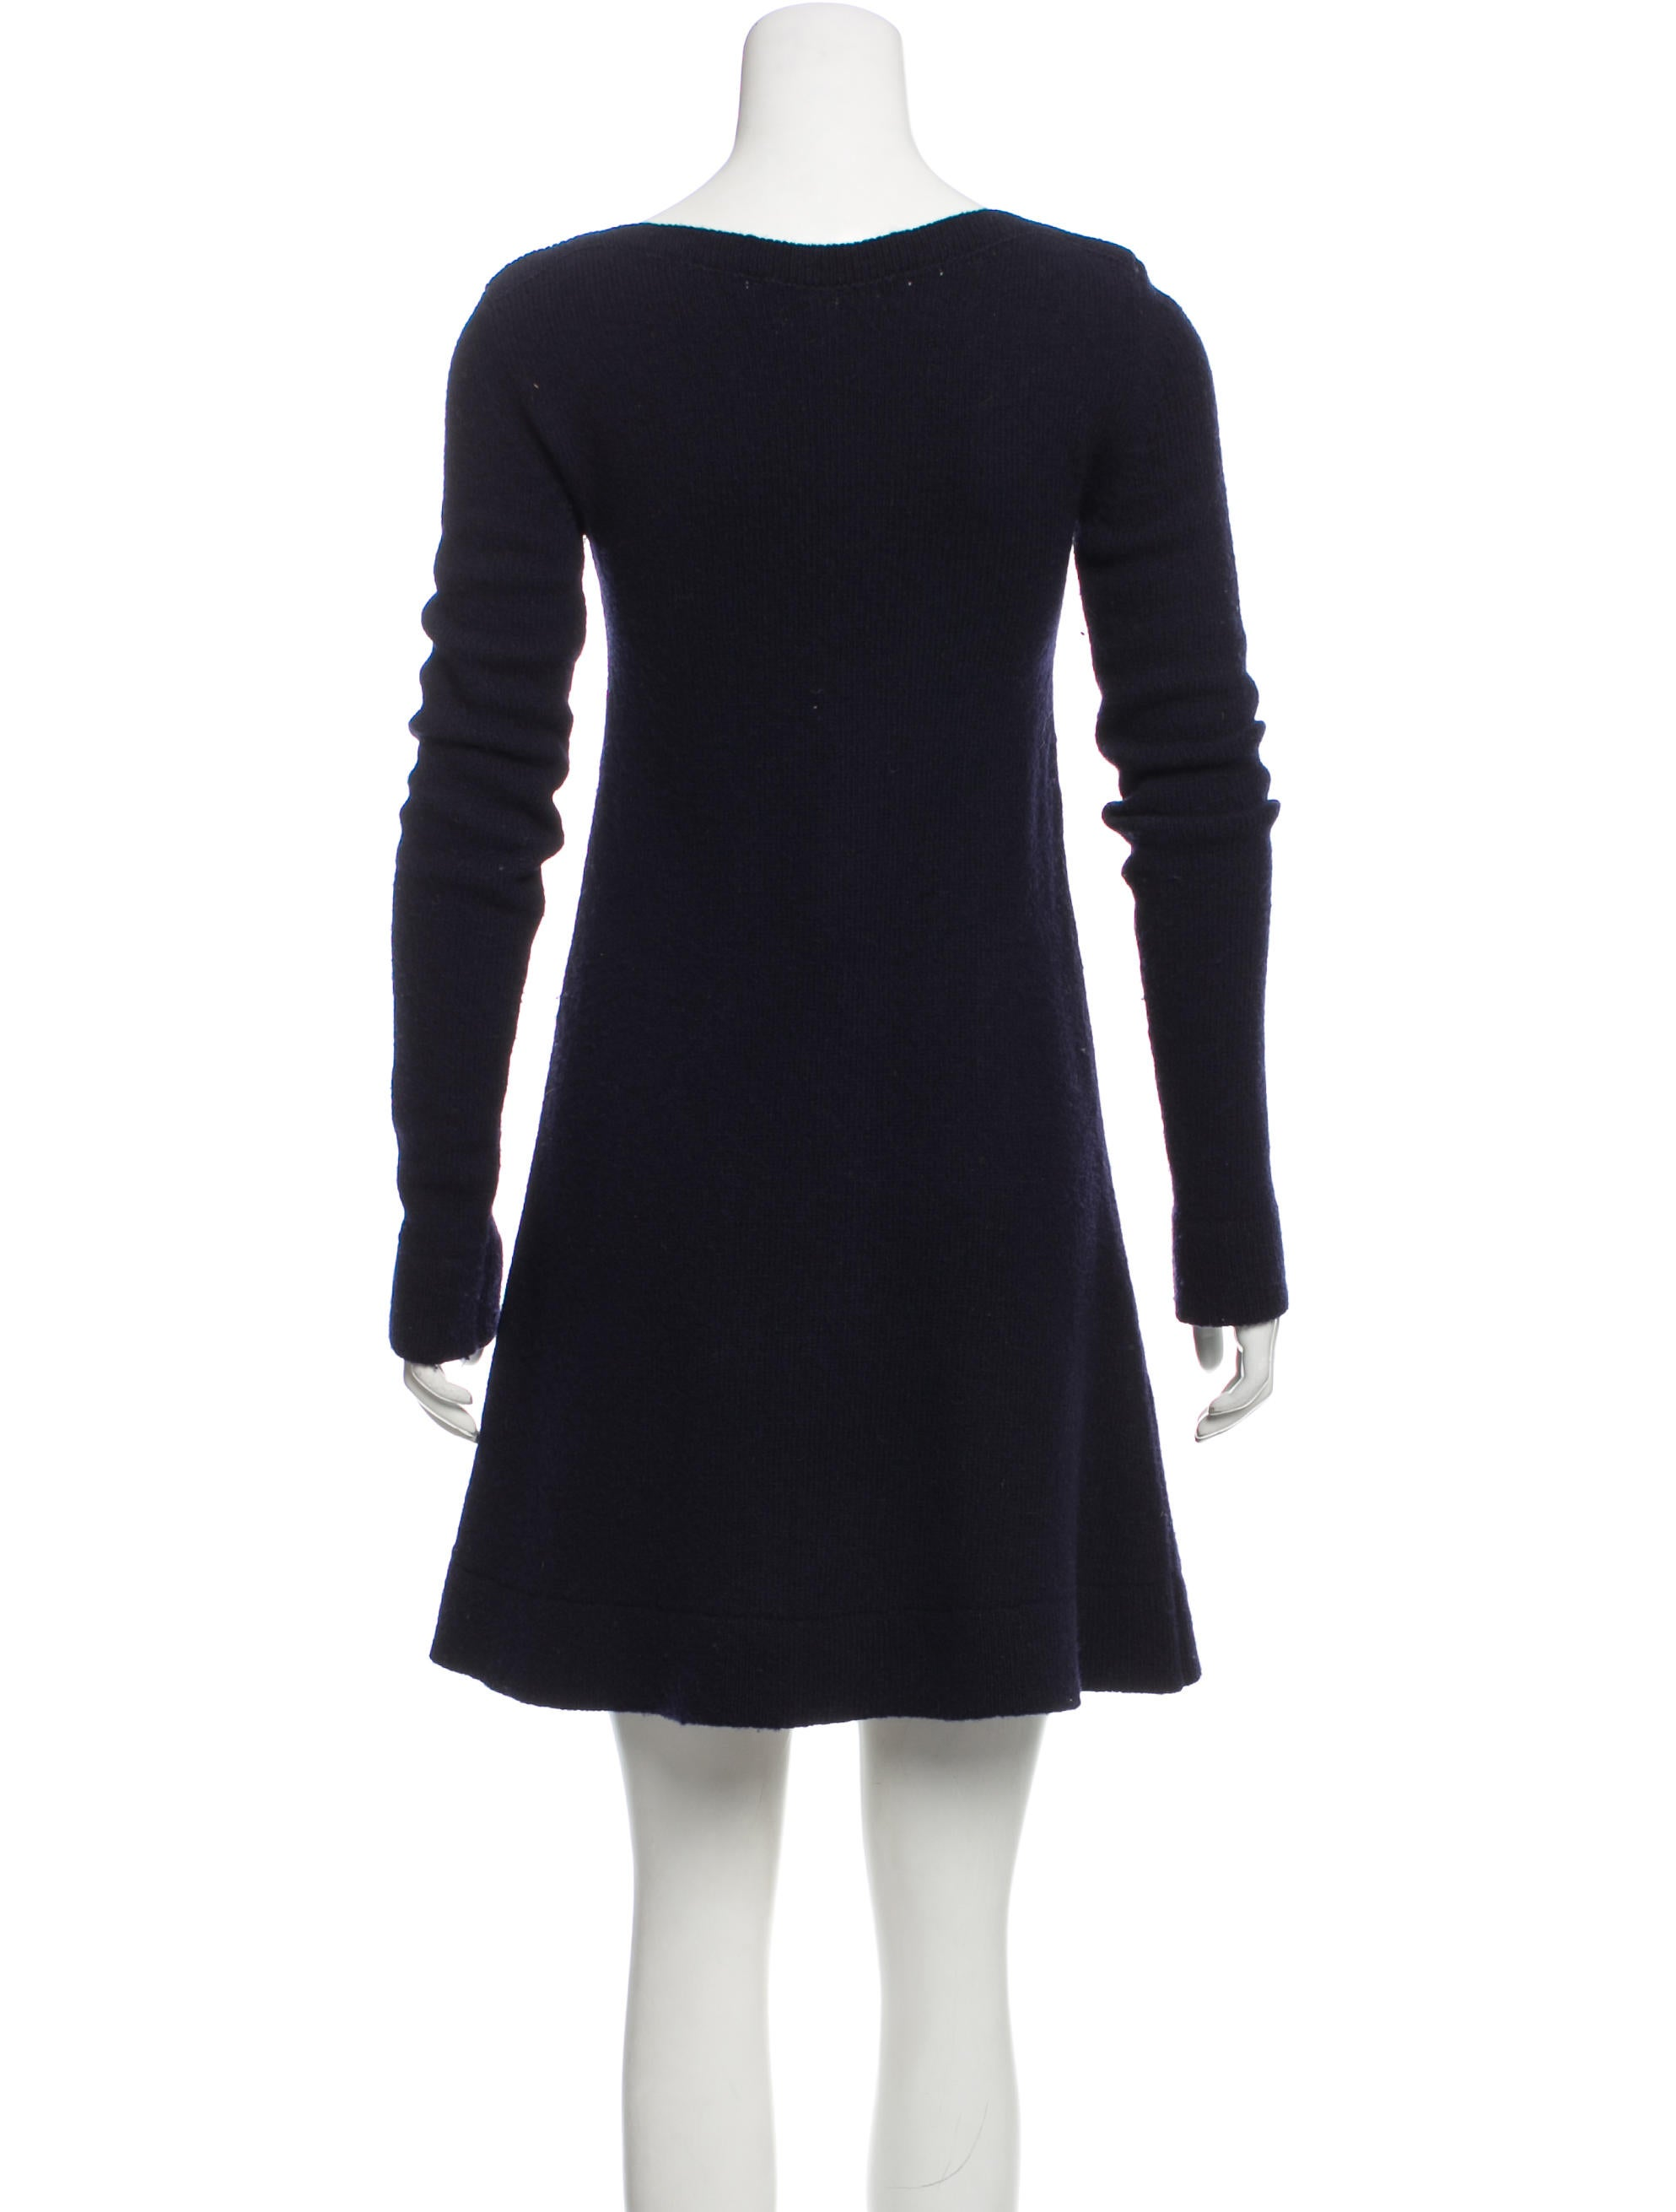 Balenciaga Wool Sweater Dress - Clothing - BAL53541 | The RealReal